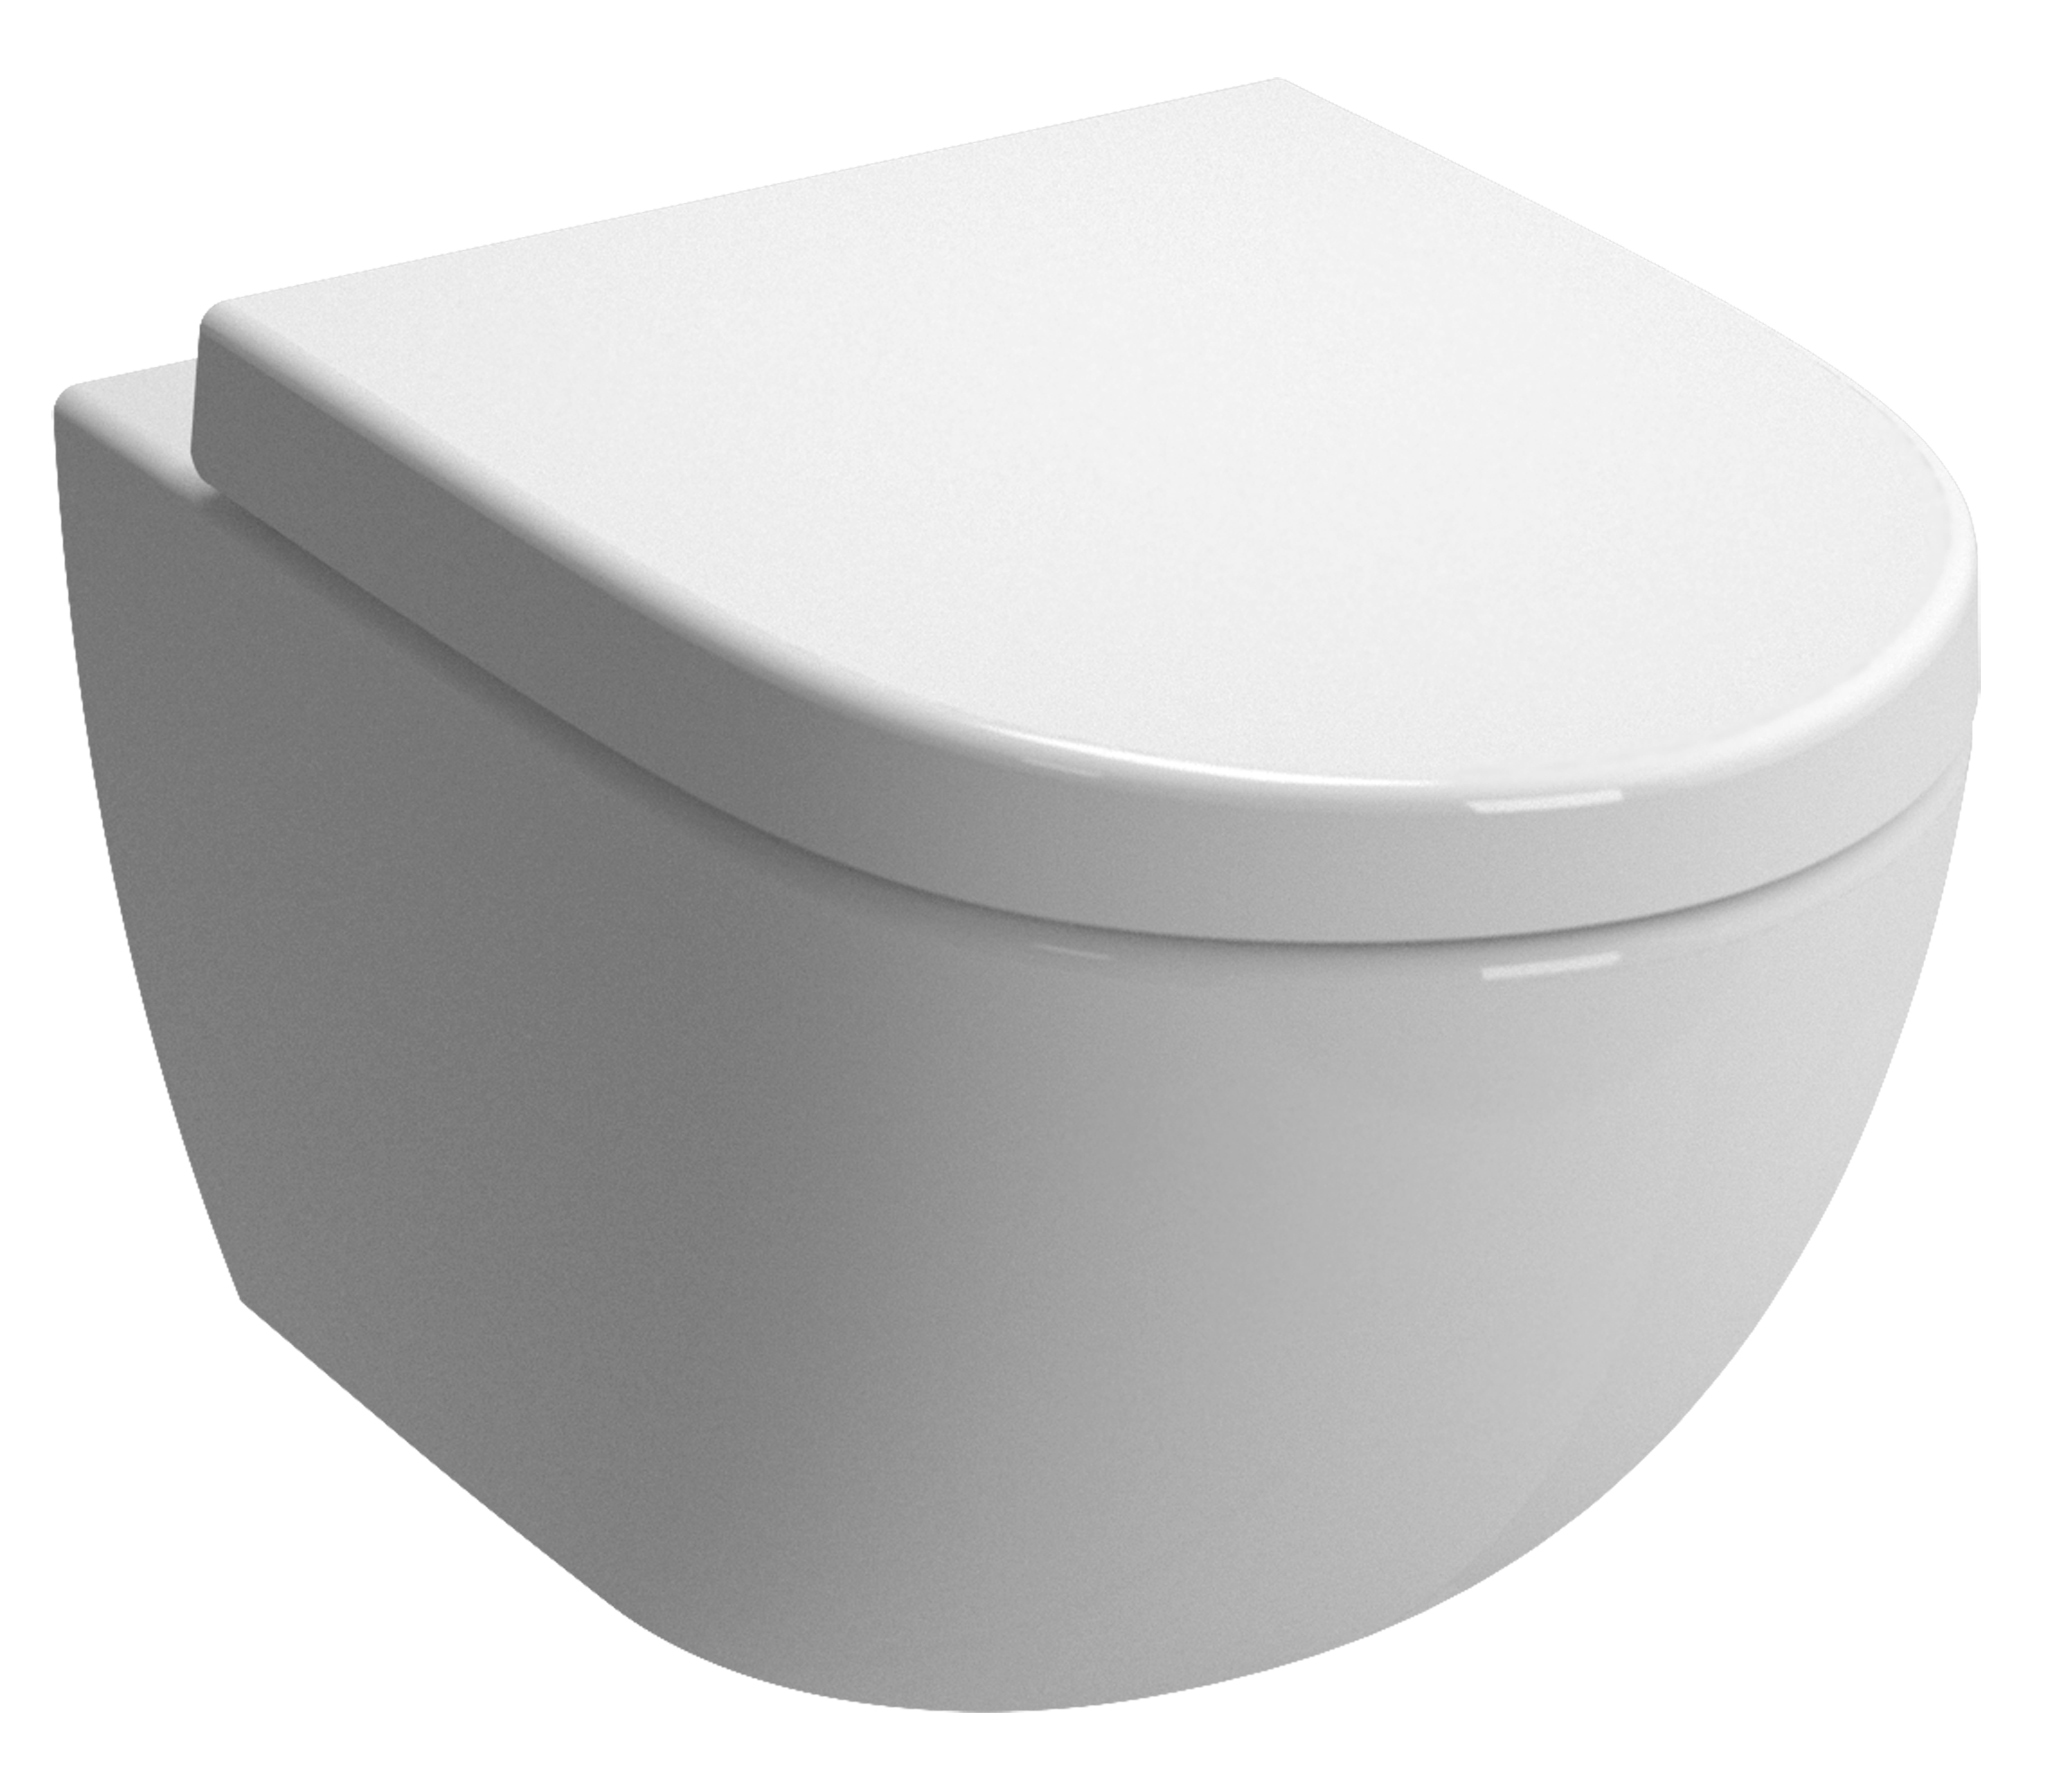 Sento Wand-WC mit Bidetfunktion